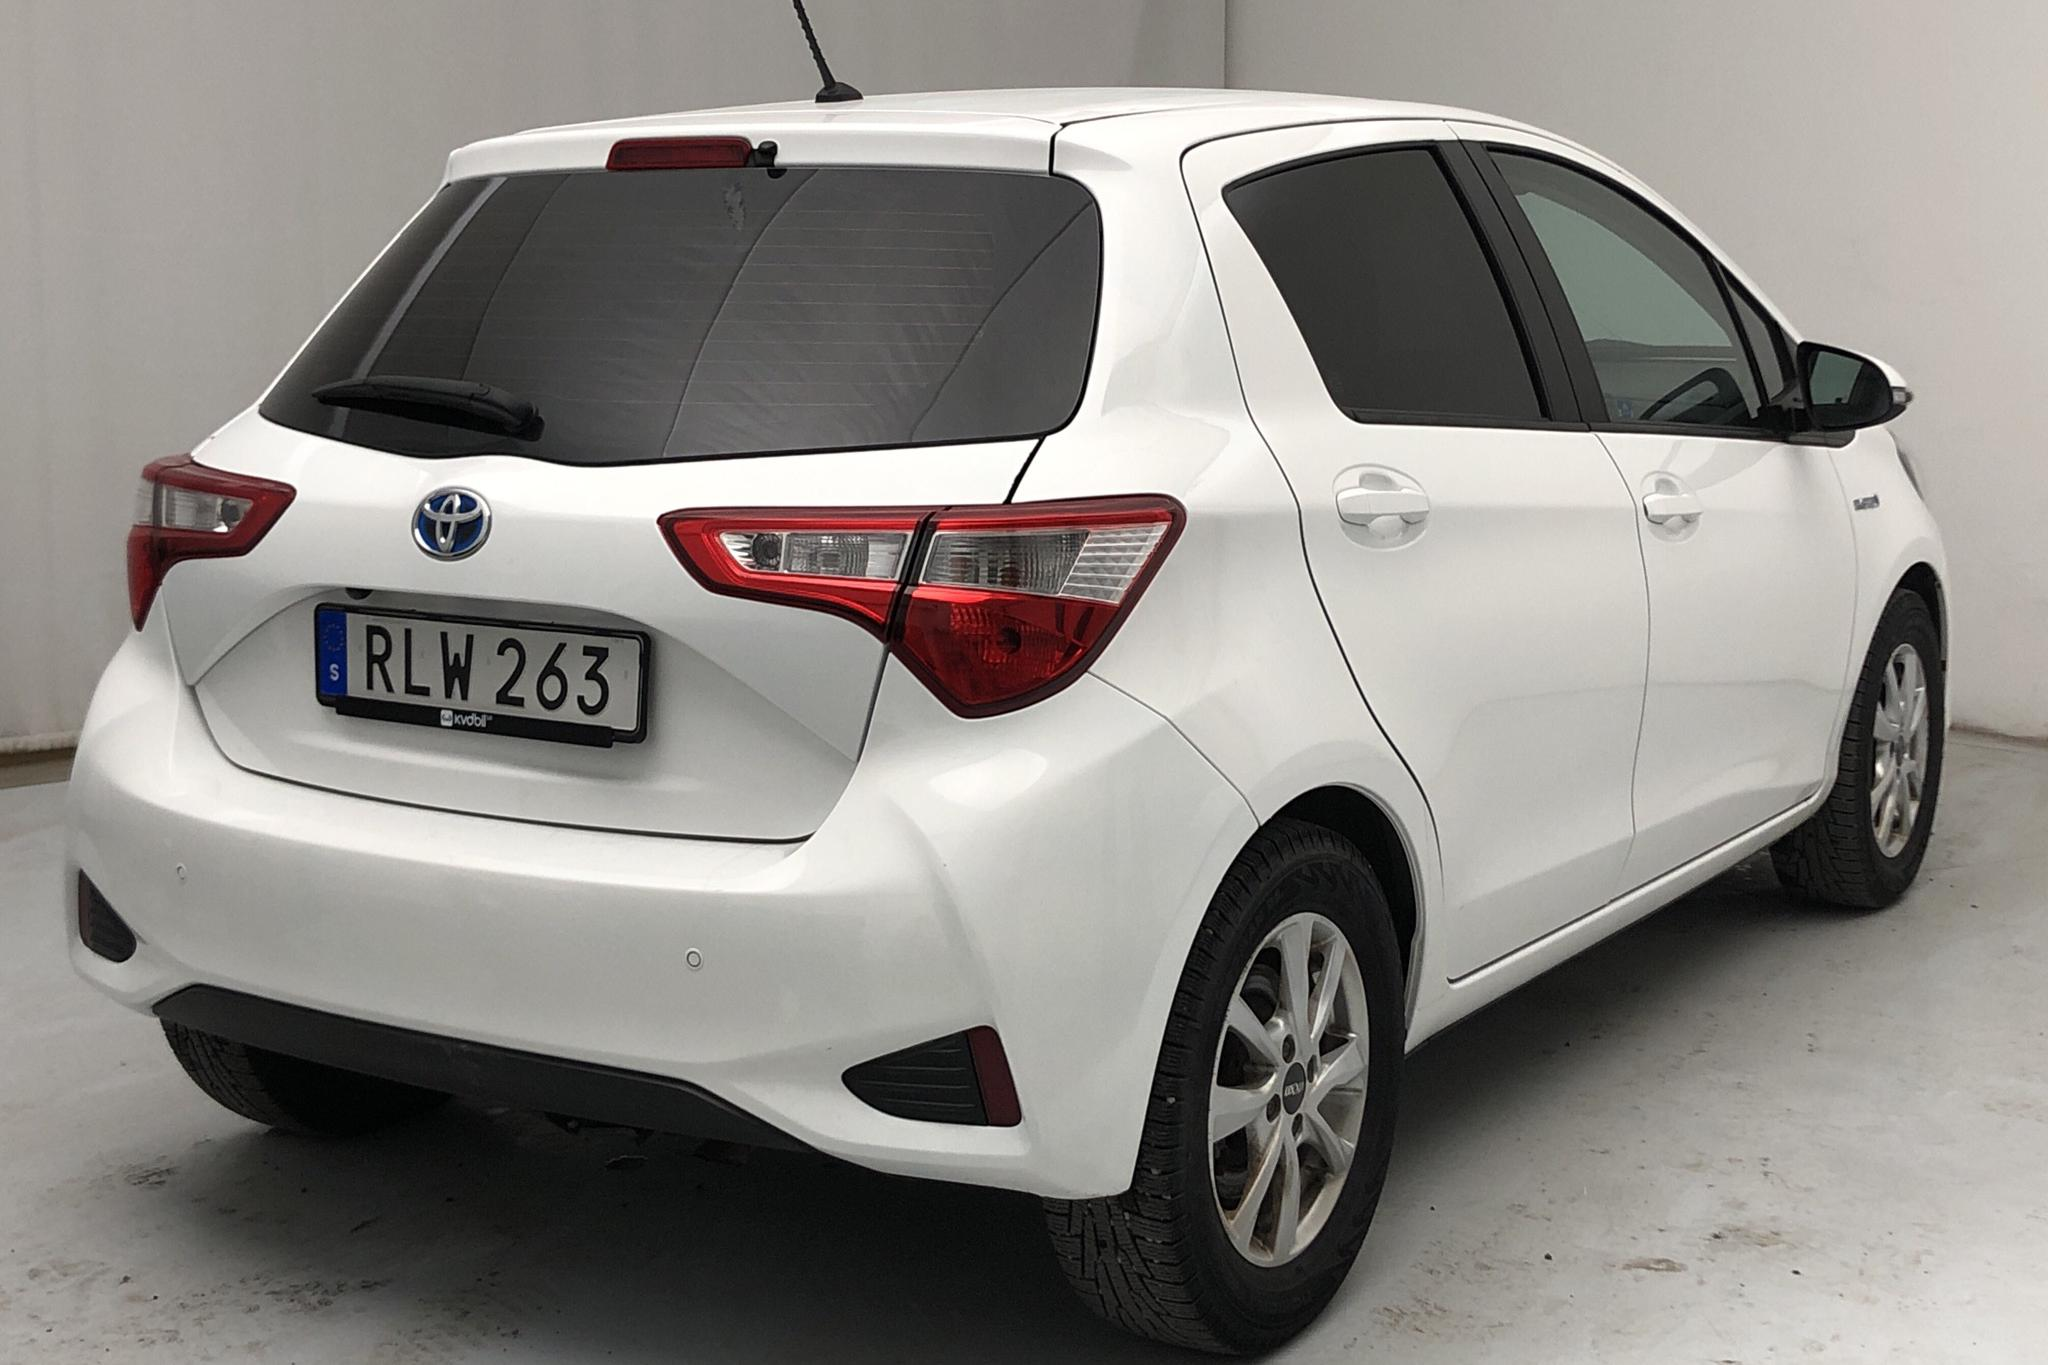 Toyota Yaris 1.5 Hybrid 5dr (101hk) - 123 970 km - Automatic - white - 2017